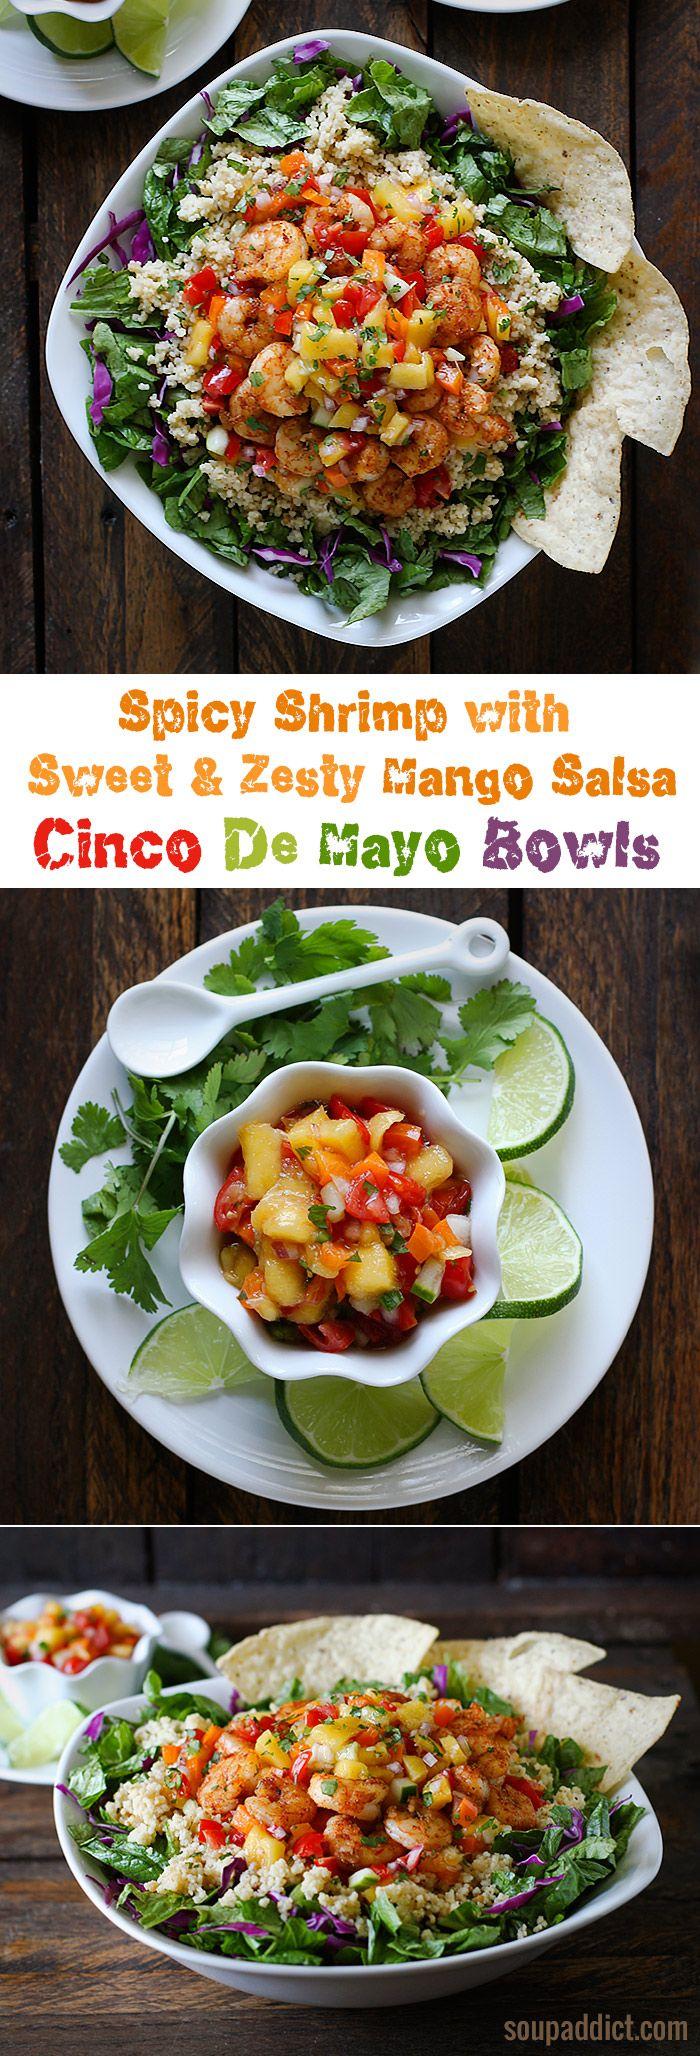 Spicy Shrimp with Sweet and Zesty Mango Salsa Cinco De Mayo Bowls from SoupAddict.com.